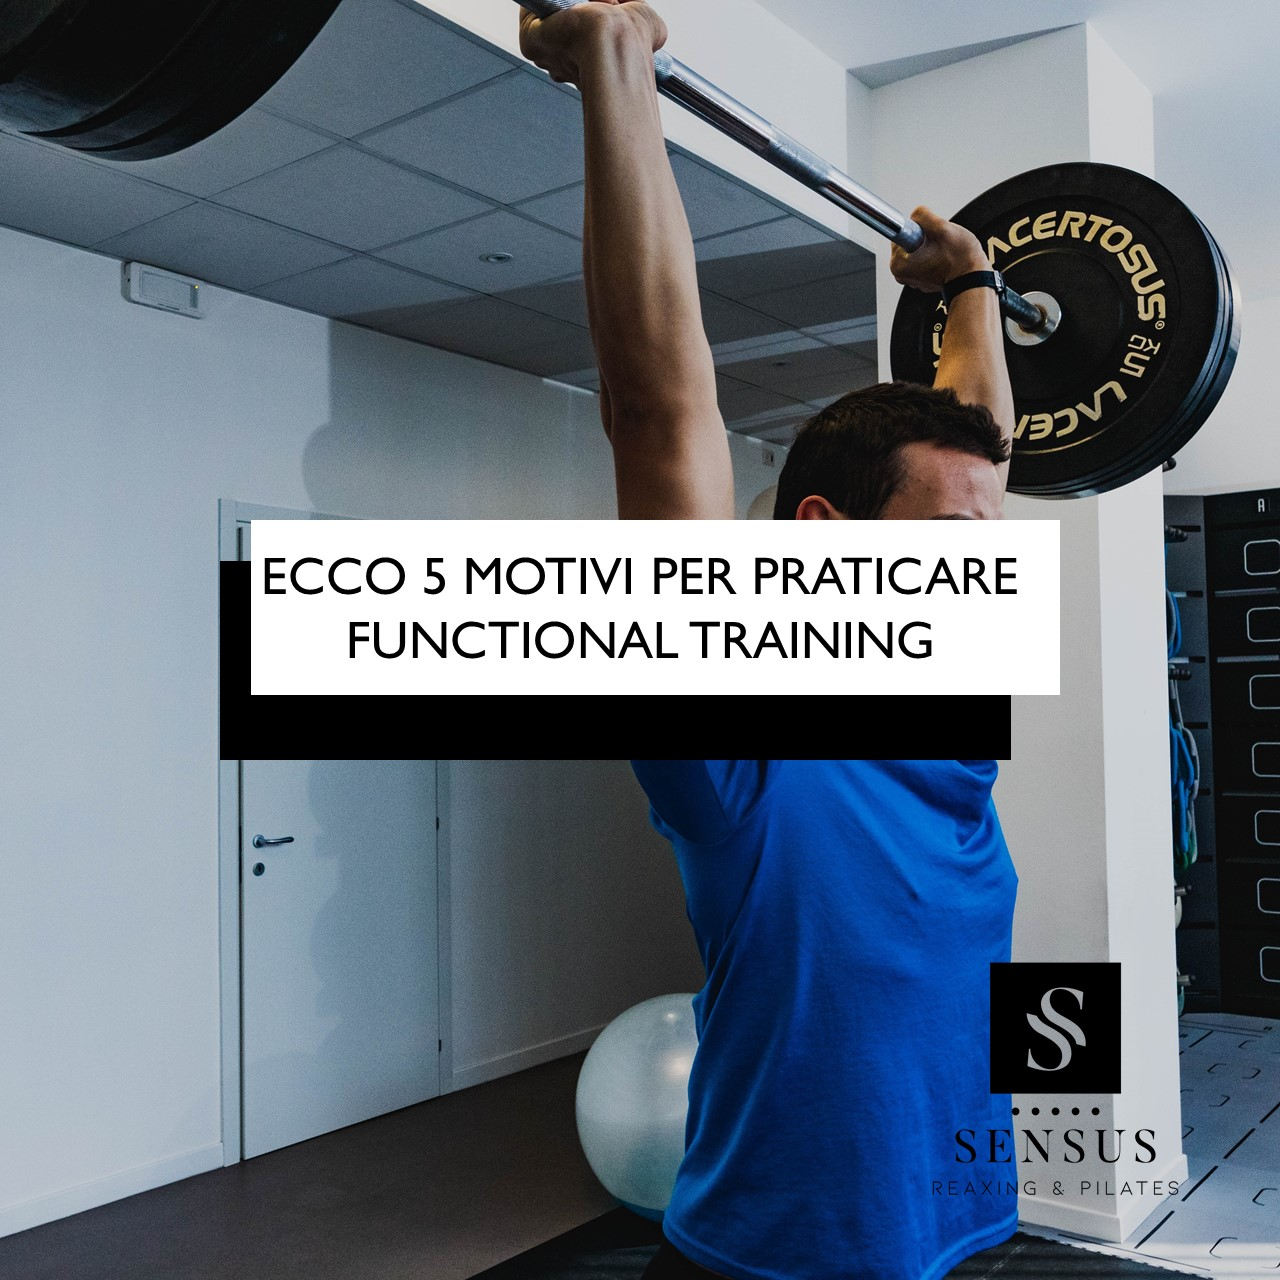 Ecco 5 Motivi Per Praticare Functional Training